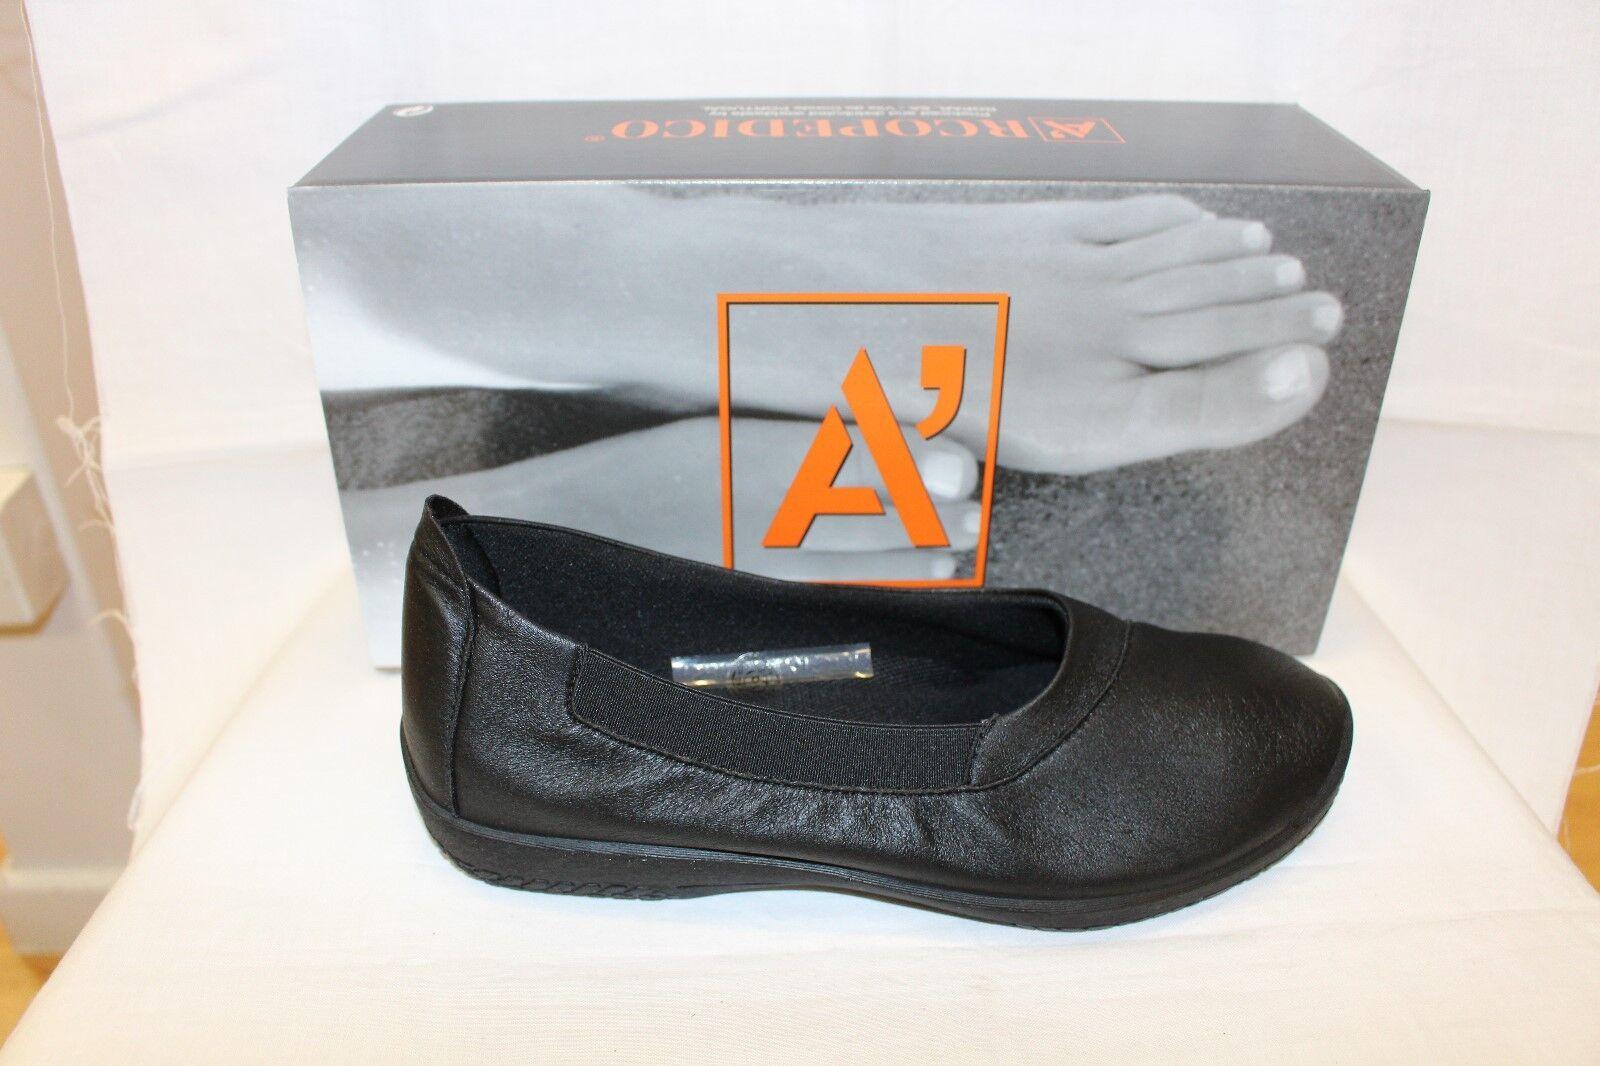 LADIES SHOES FOOTWEAR -Arcopedico Lucia black